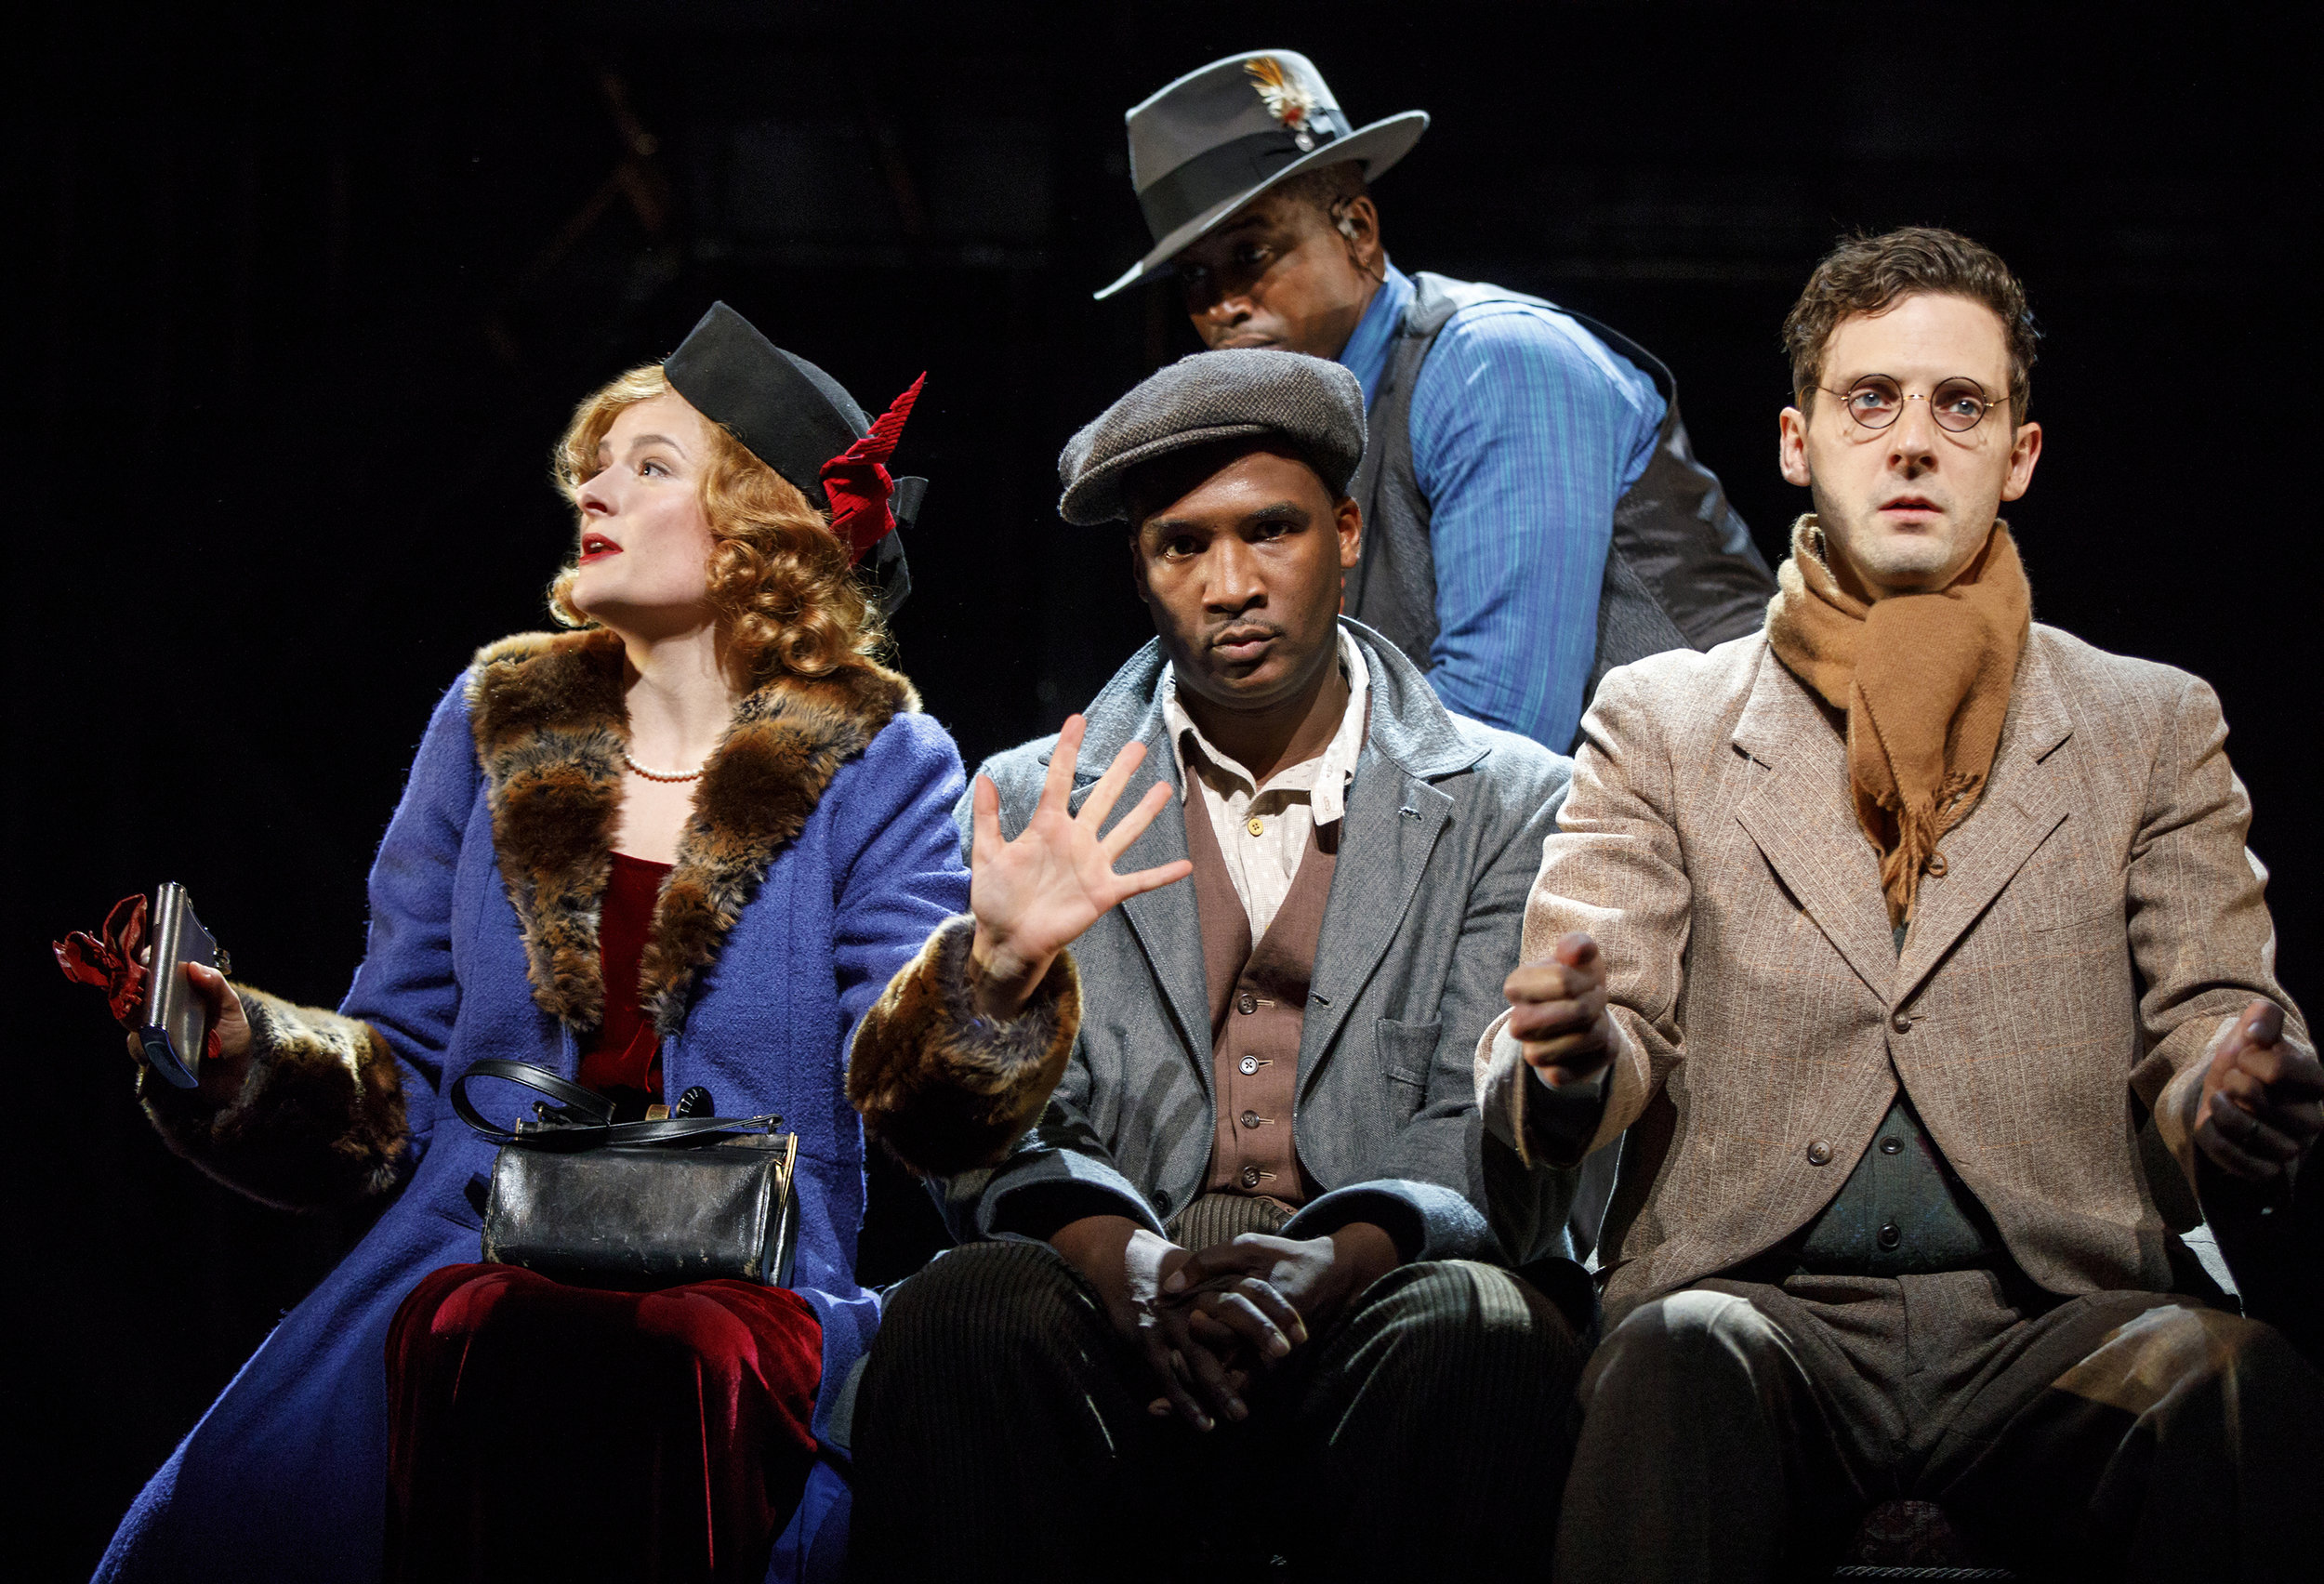 Mary Dalton (Louisa Jacobson), Bigger (Jerod Haynes), Jan (Joby Earle), background: The Black Rat (Jason Bowen)